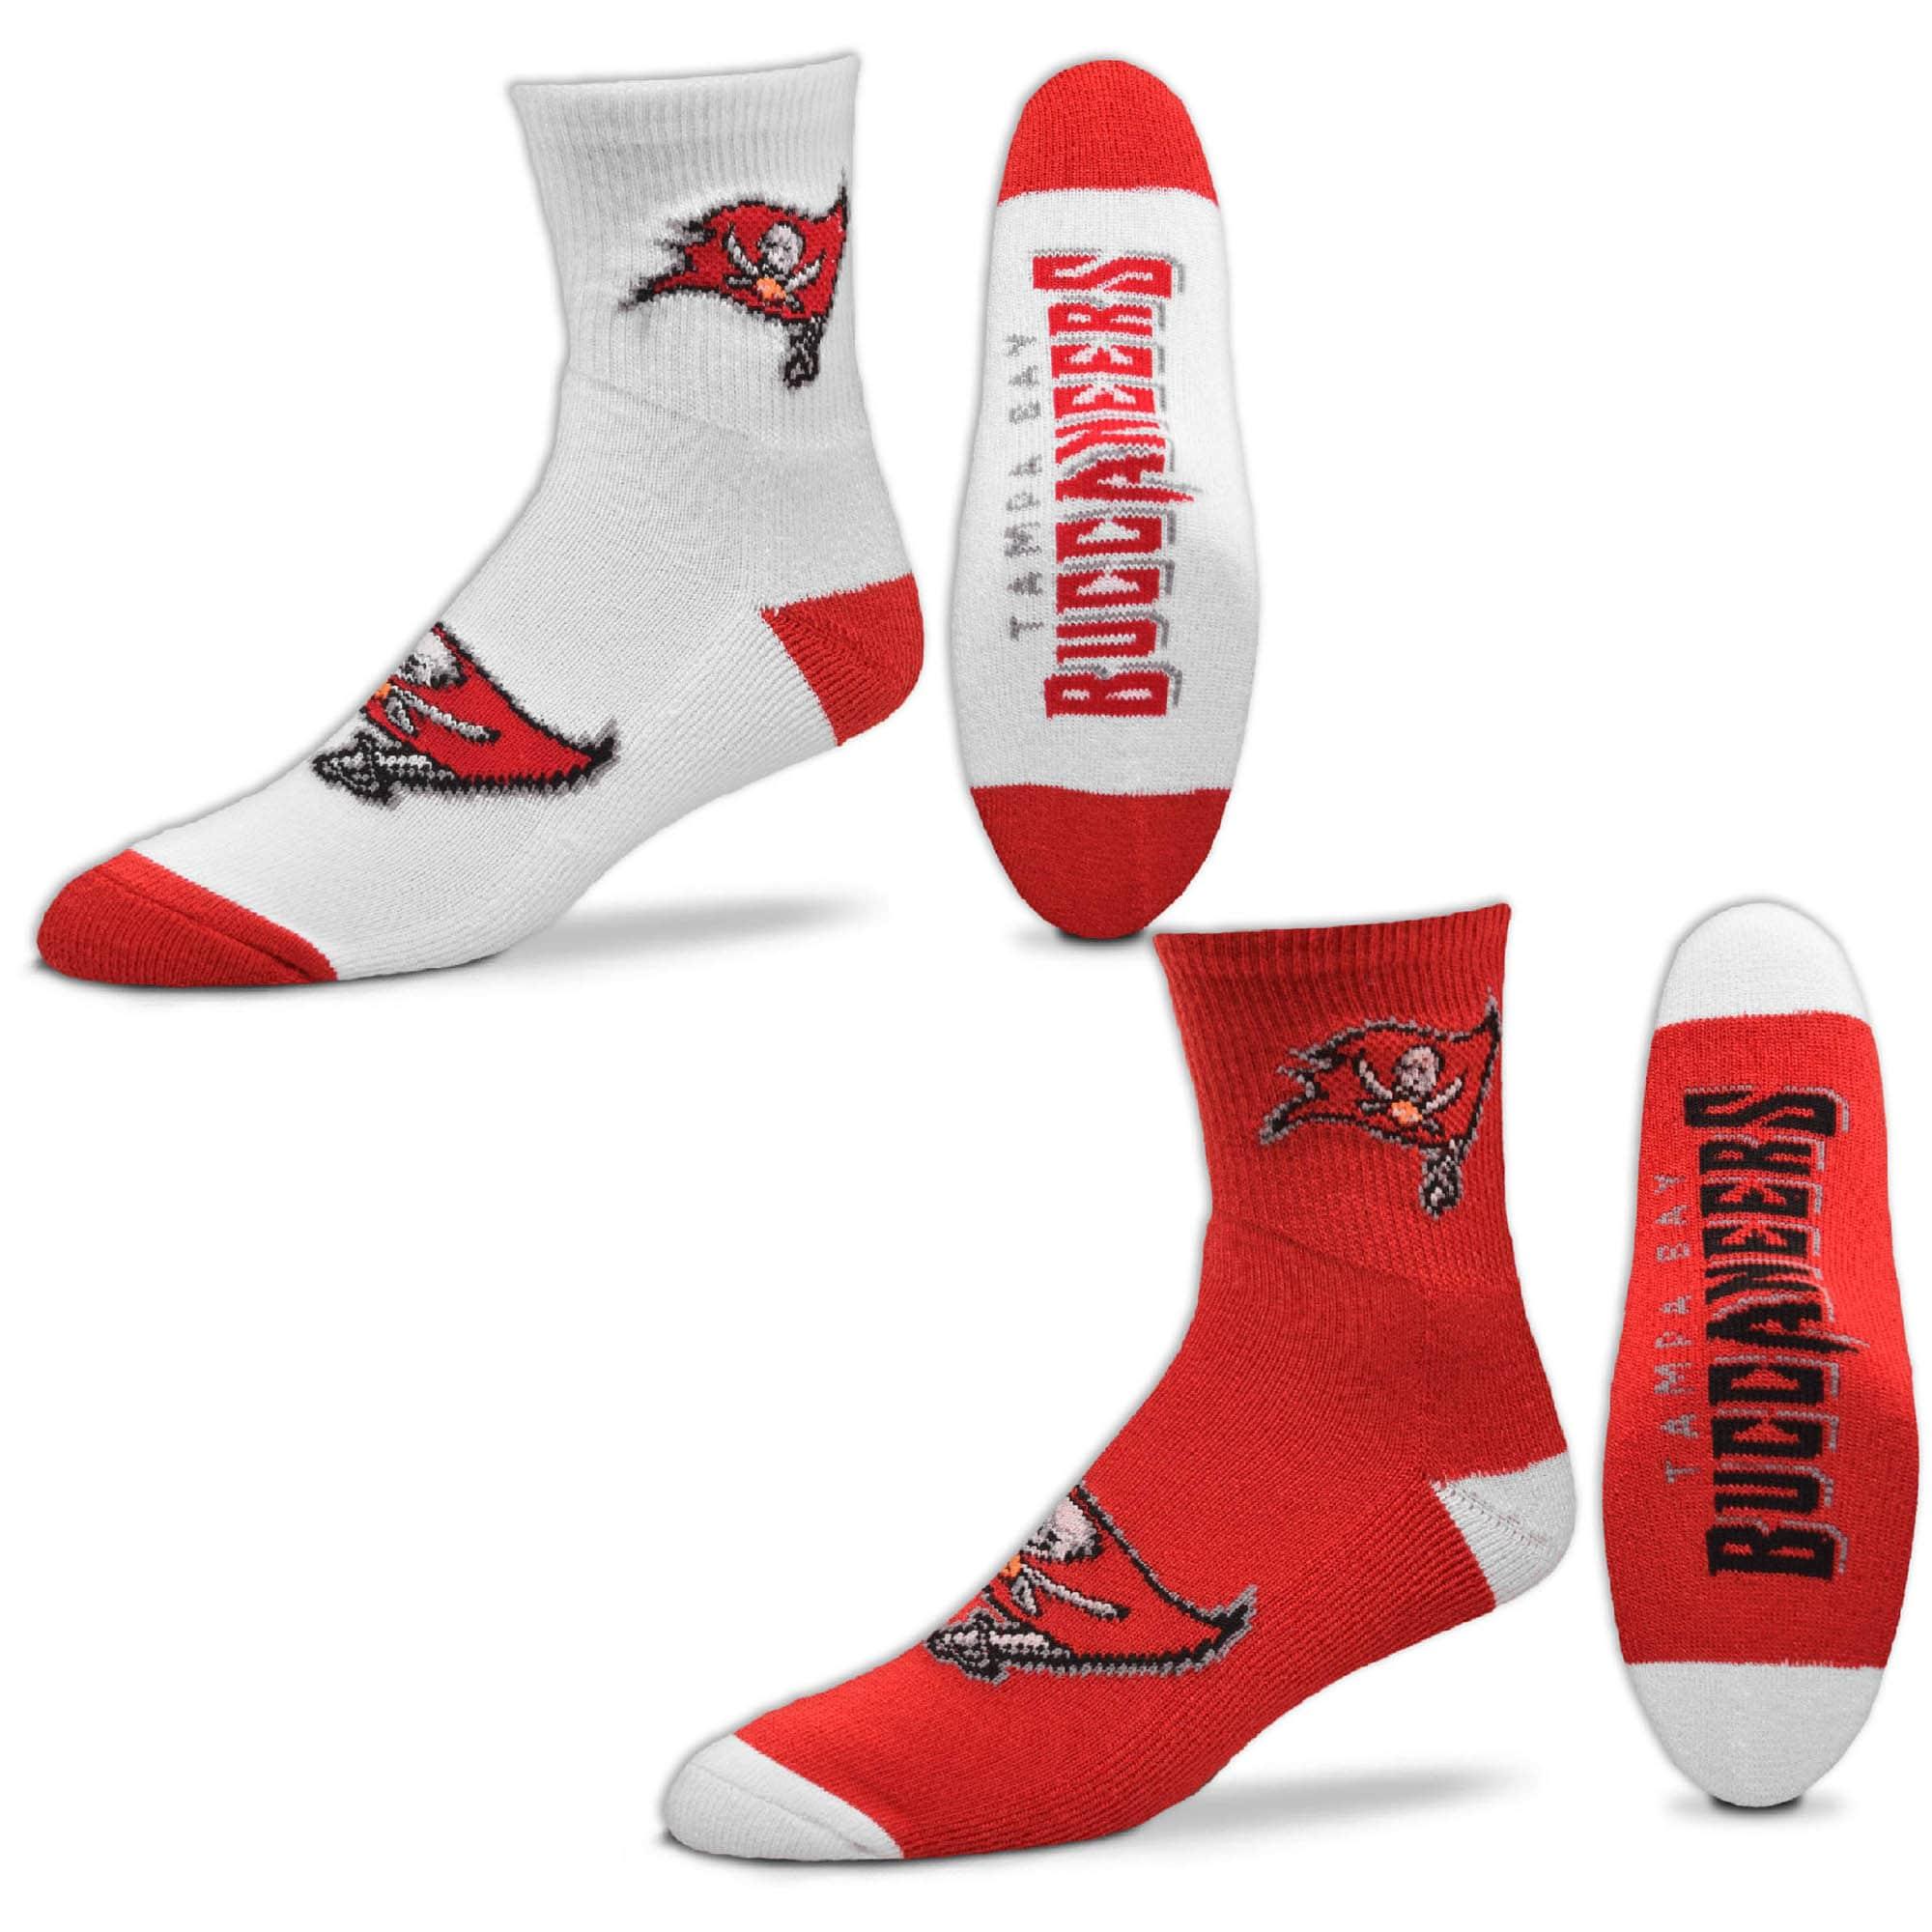 Tampa Bay Buccaneers For Bare Feet Quarter-Length Socks Two-Pack Set